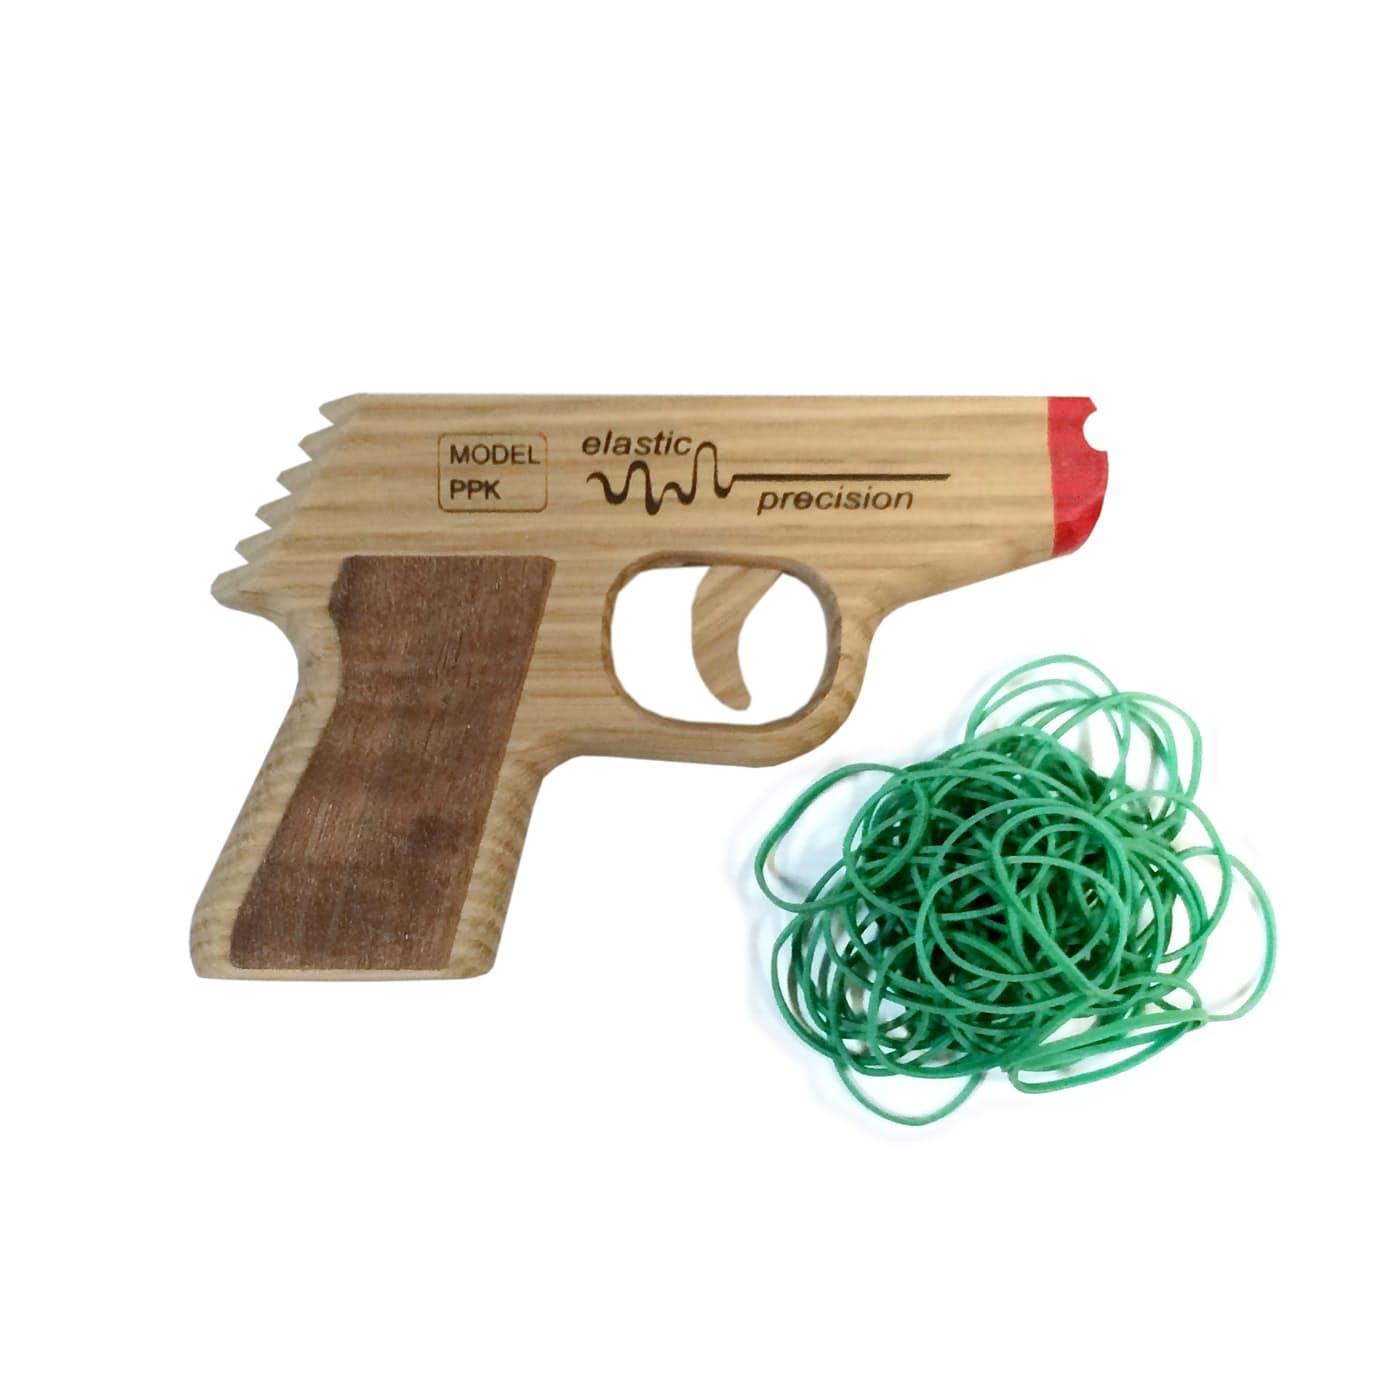 N0p60rw8jm elastic precision ppk rubber band gun 0 original